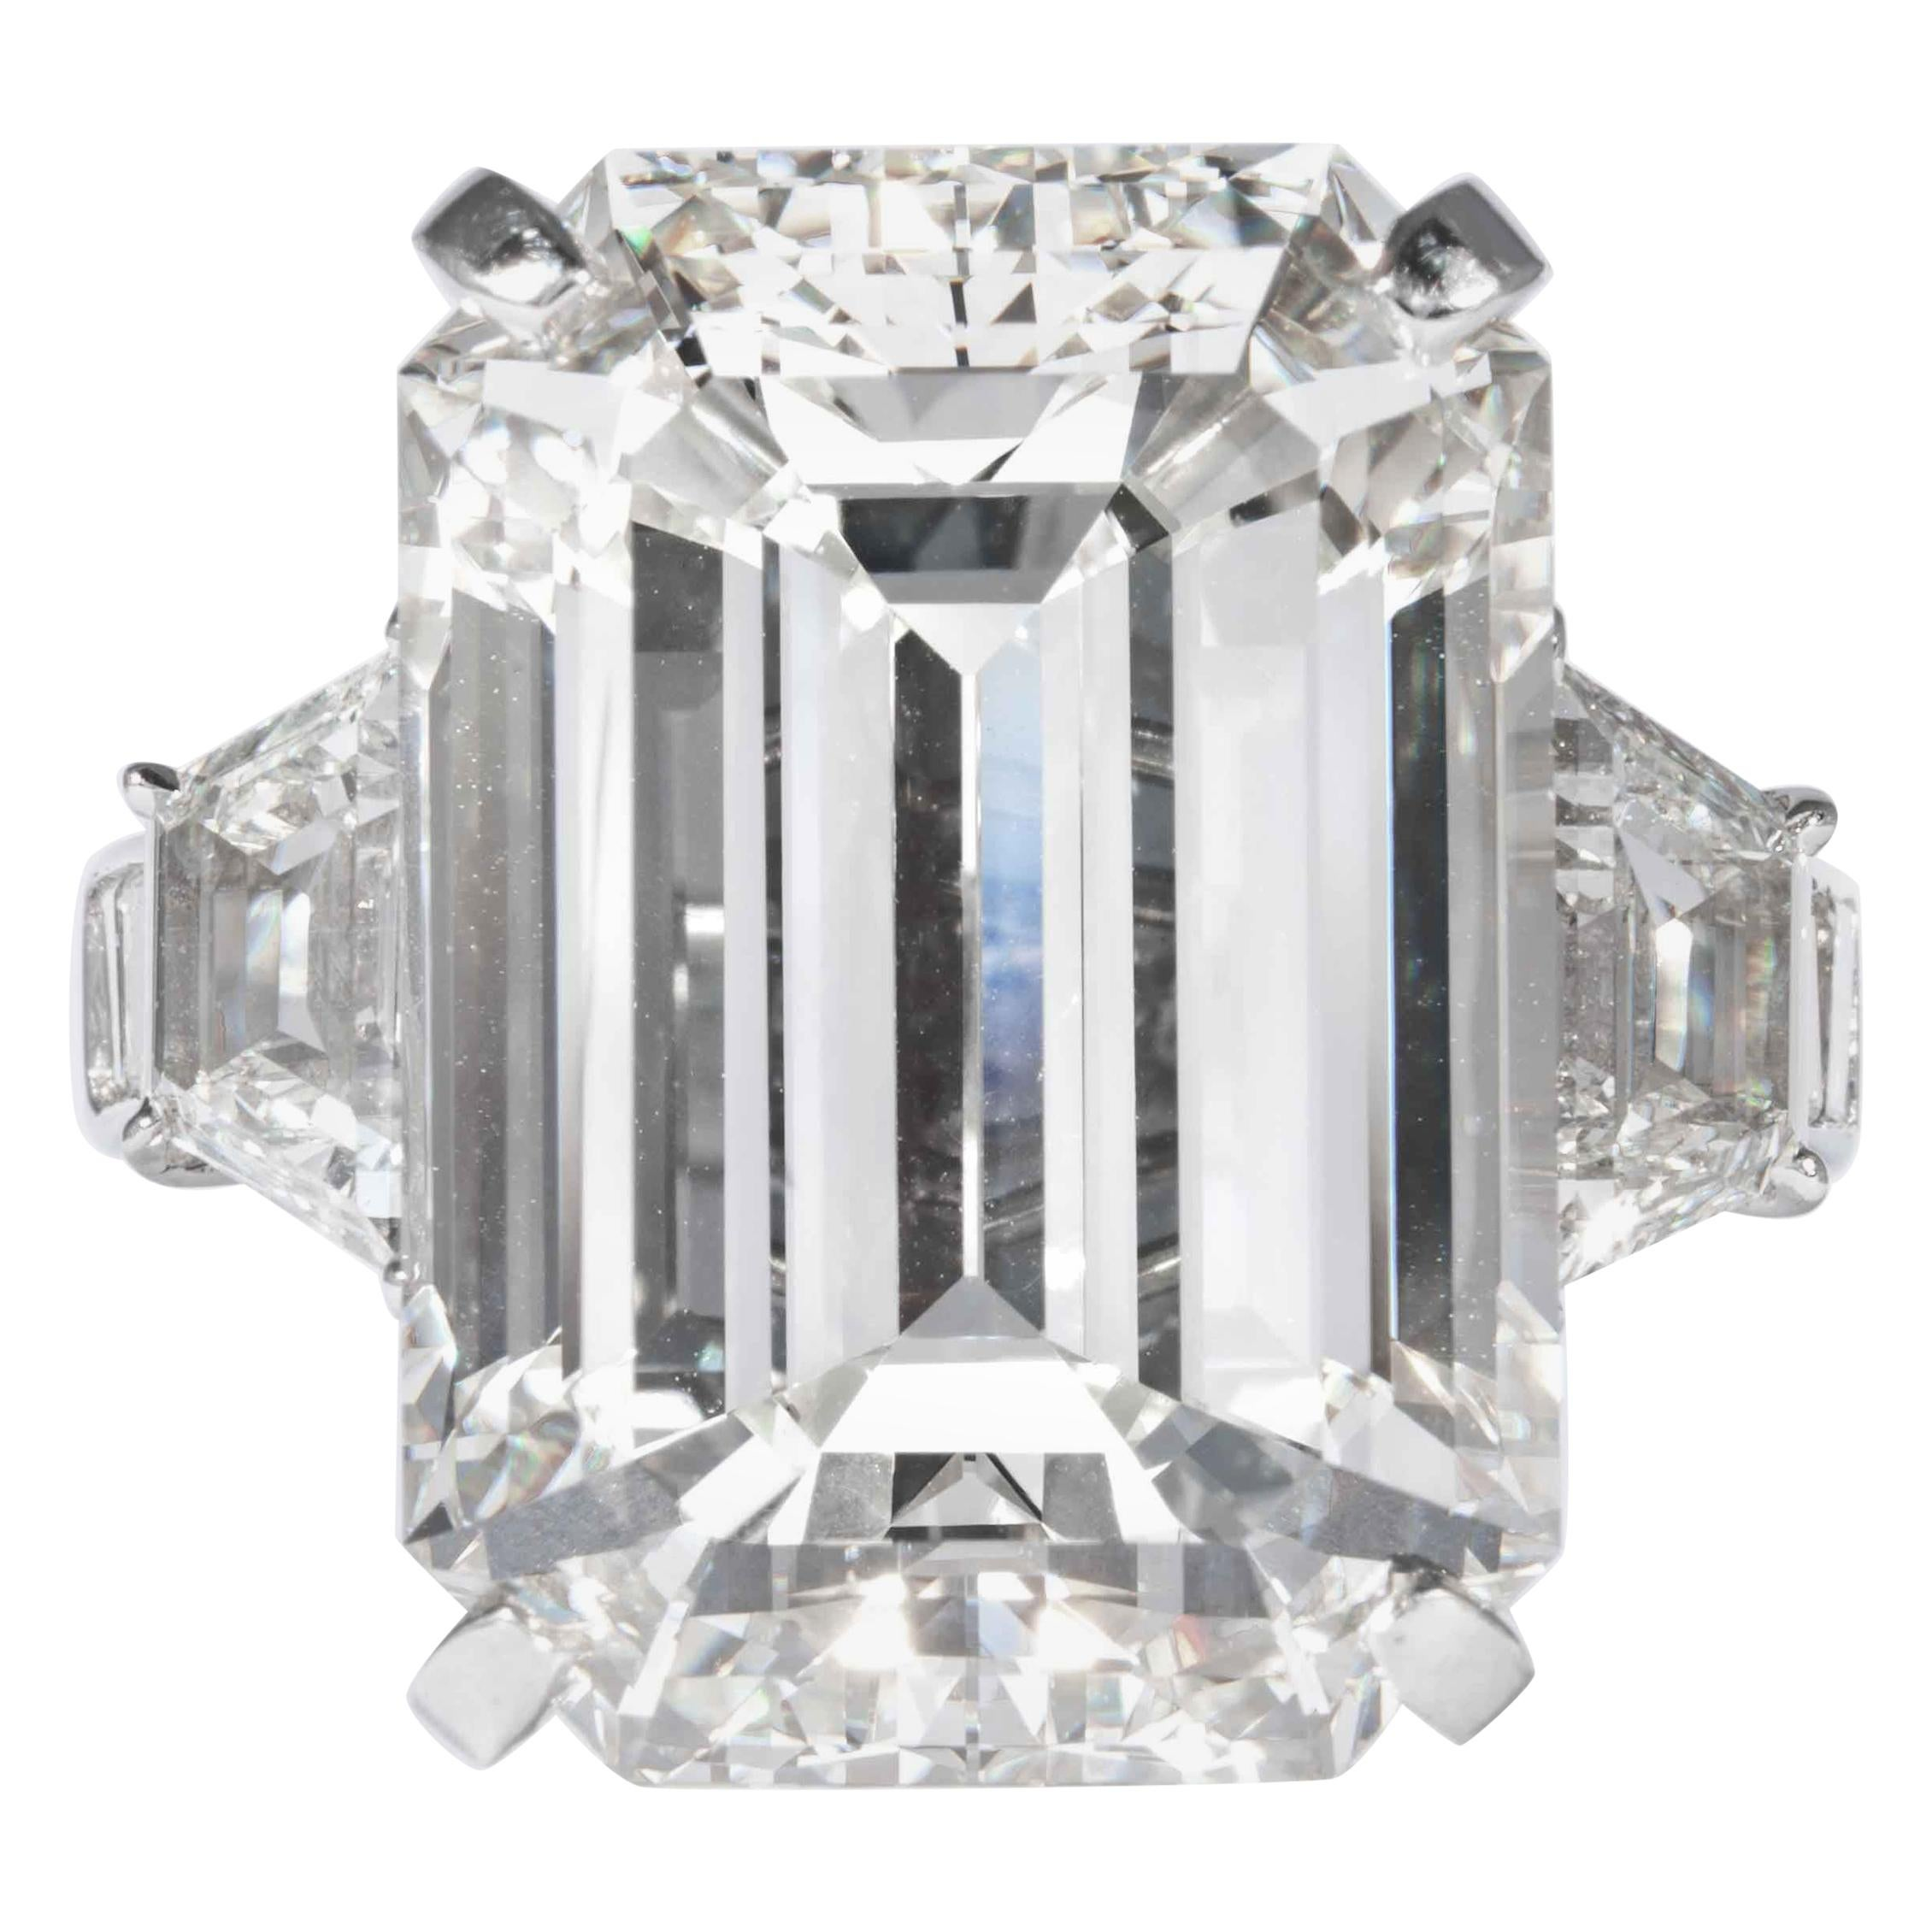 Shreve, Crump & Low GIA Certified 22.02 Carat J VS2 Emerald Cut Diamond Ring